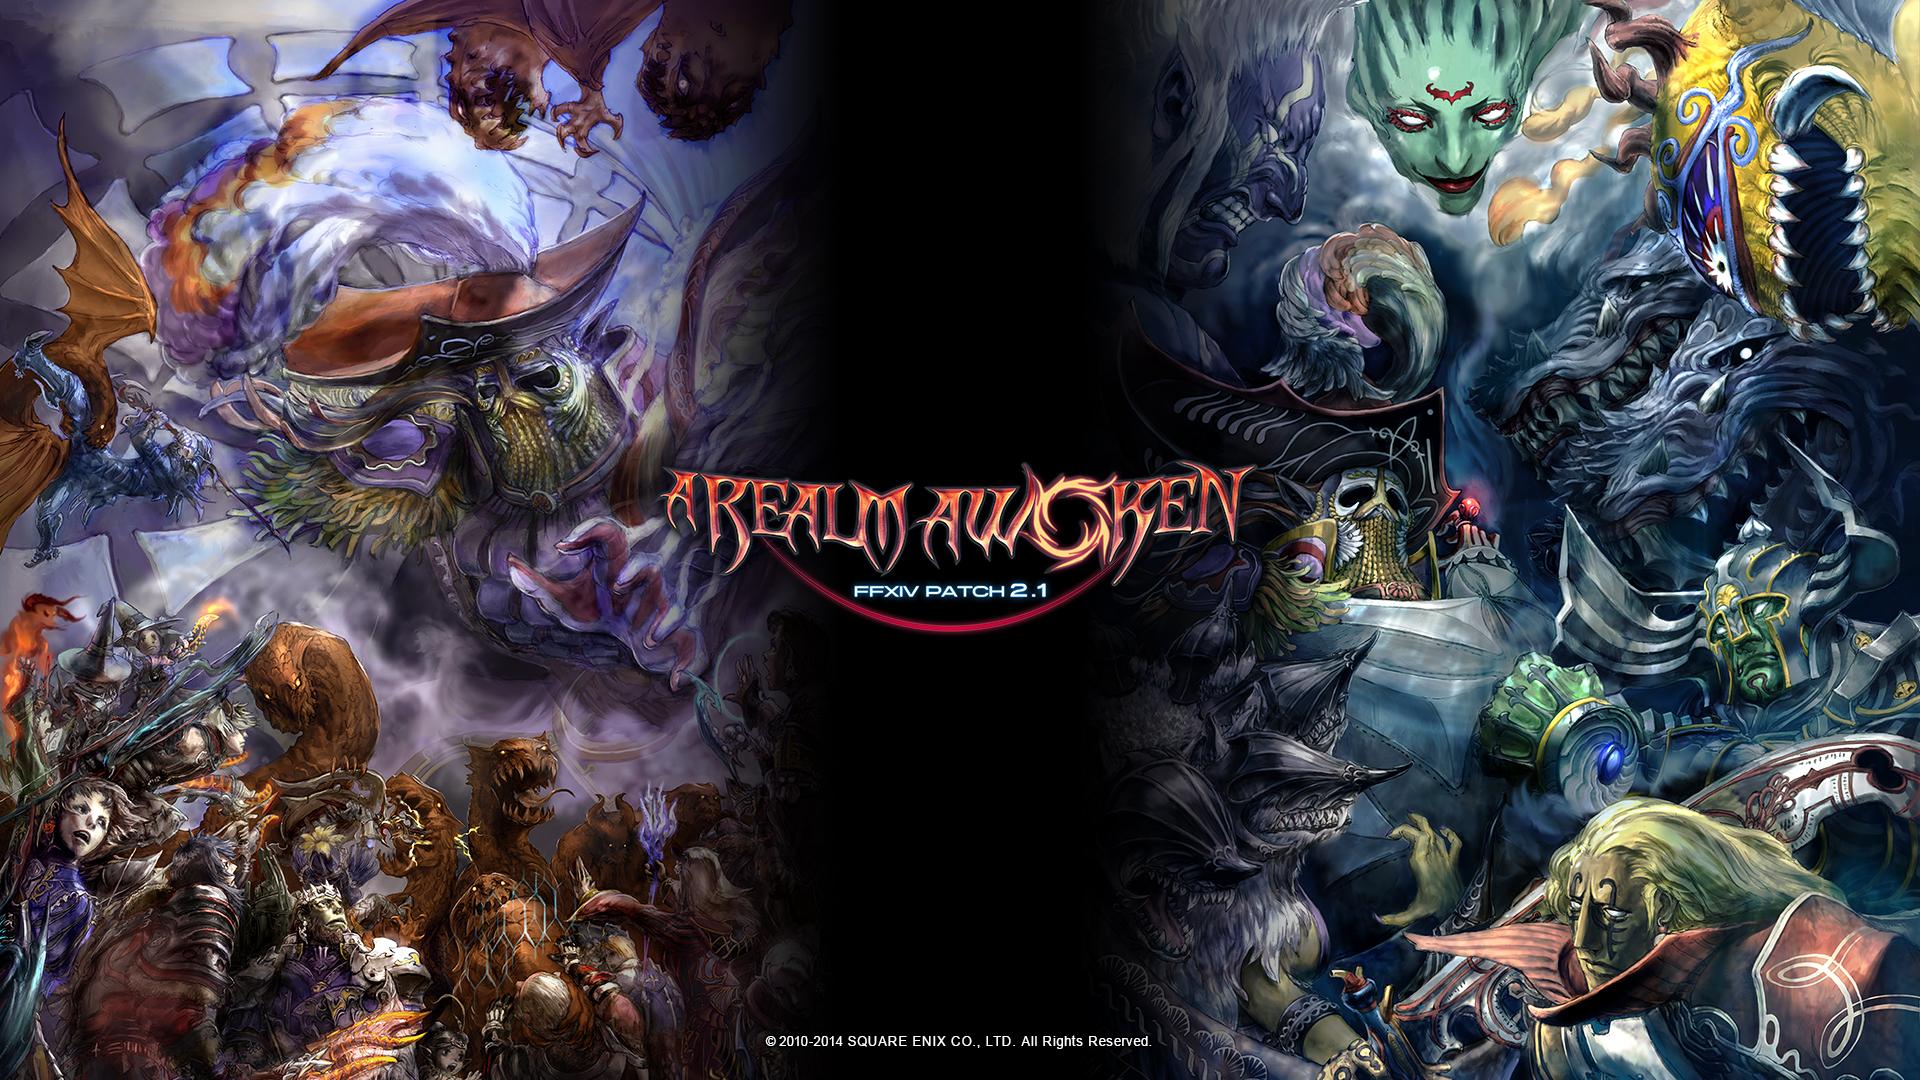 Final fantasy xiv wallpaper 013 wallpapers ethereal games - Ffxiv wallpaper 1080p ...